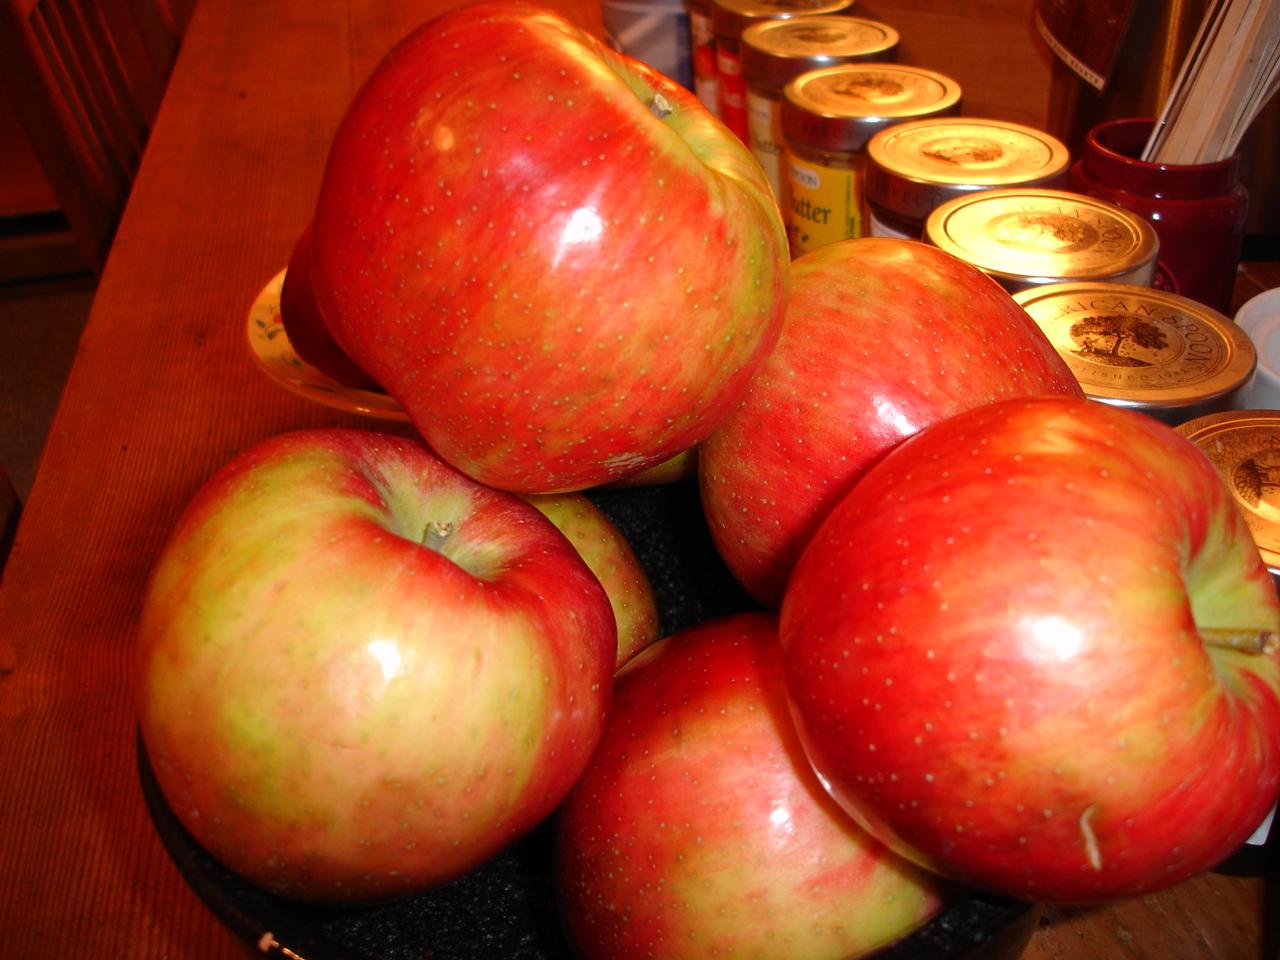 Michigan Honeycrisp Apples at the Breakfast Table White Rabbit Inn